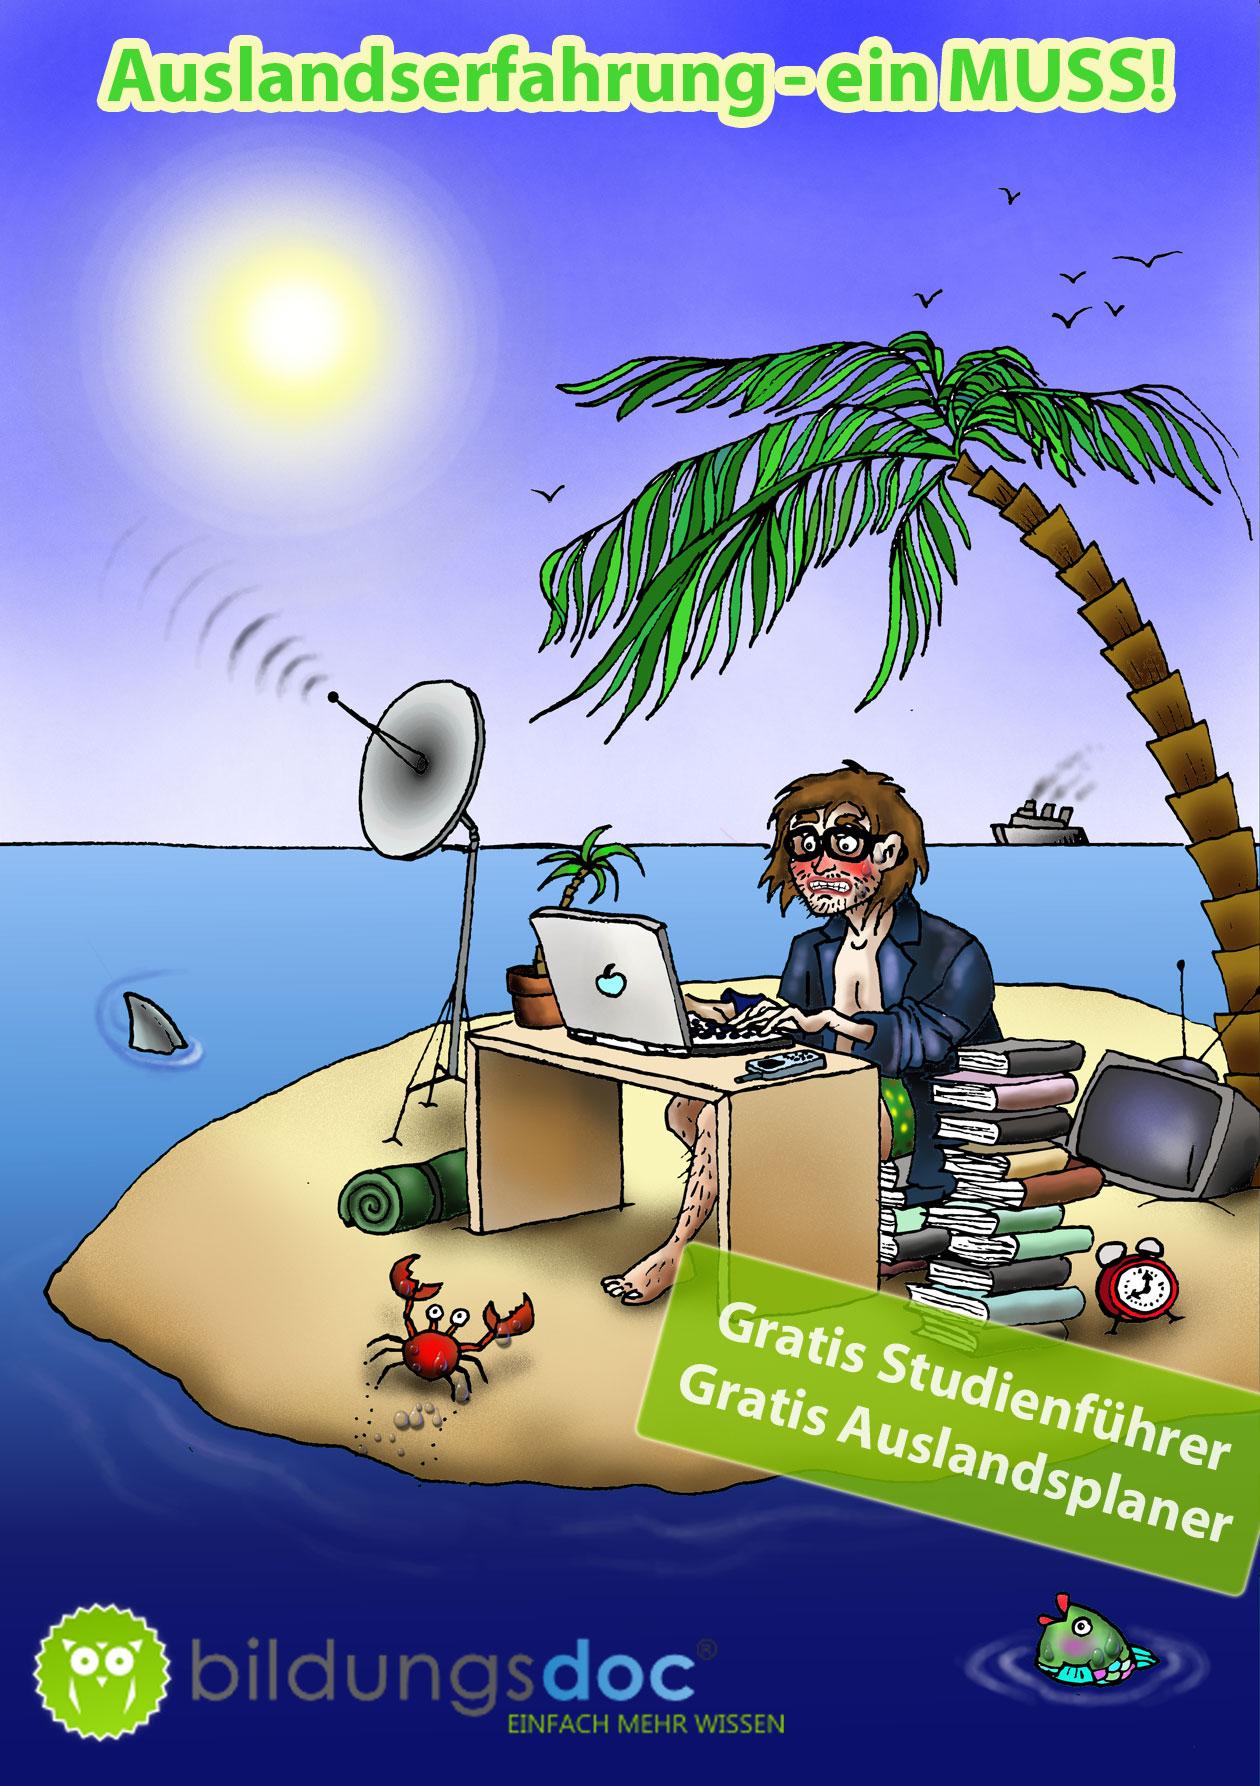 Versicherungen News & Infos | Auslandserfahrung – ein MUSS!